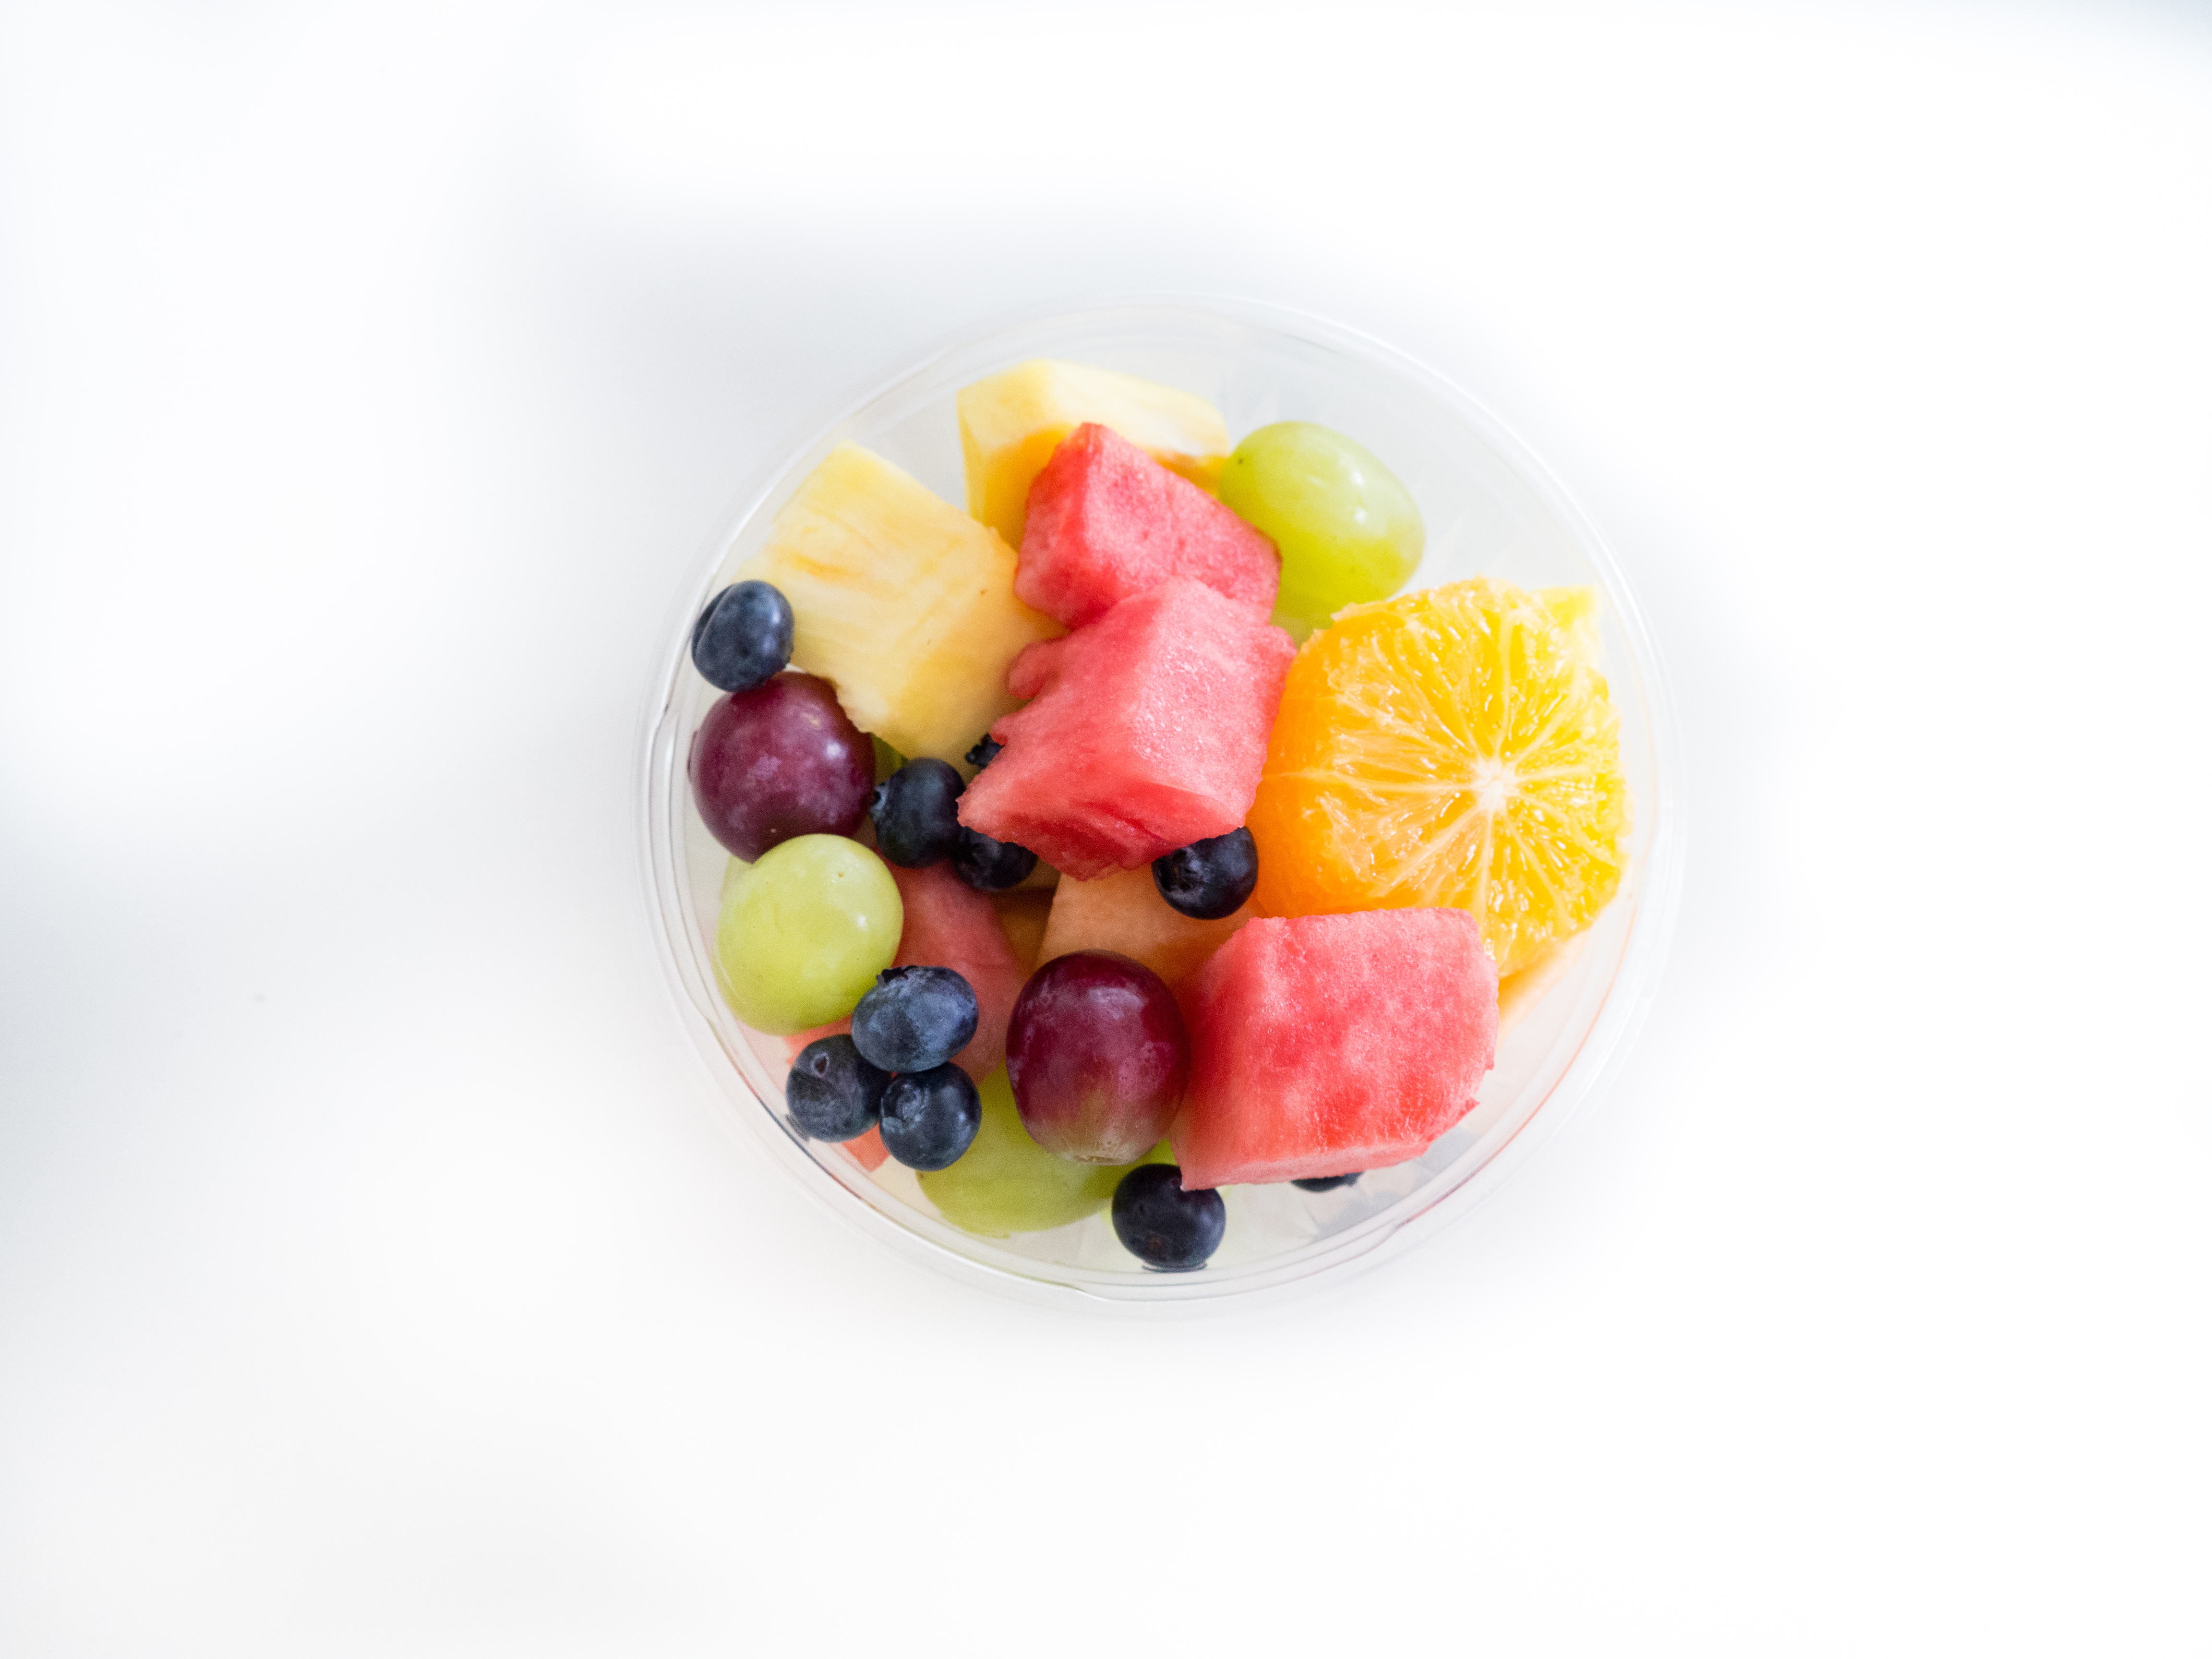 modeling healthy eating